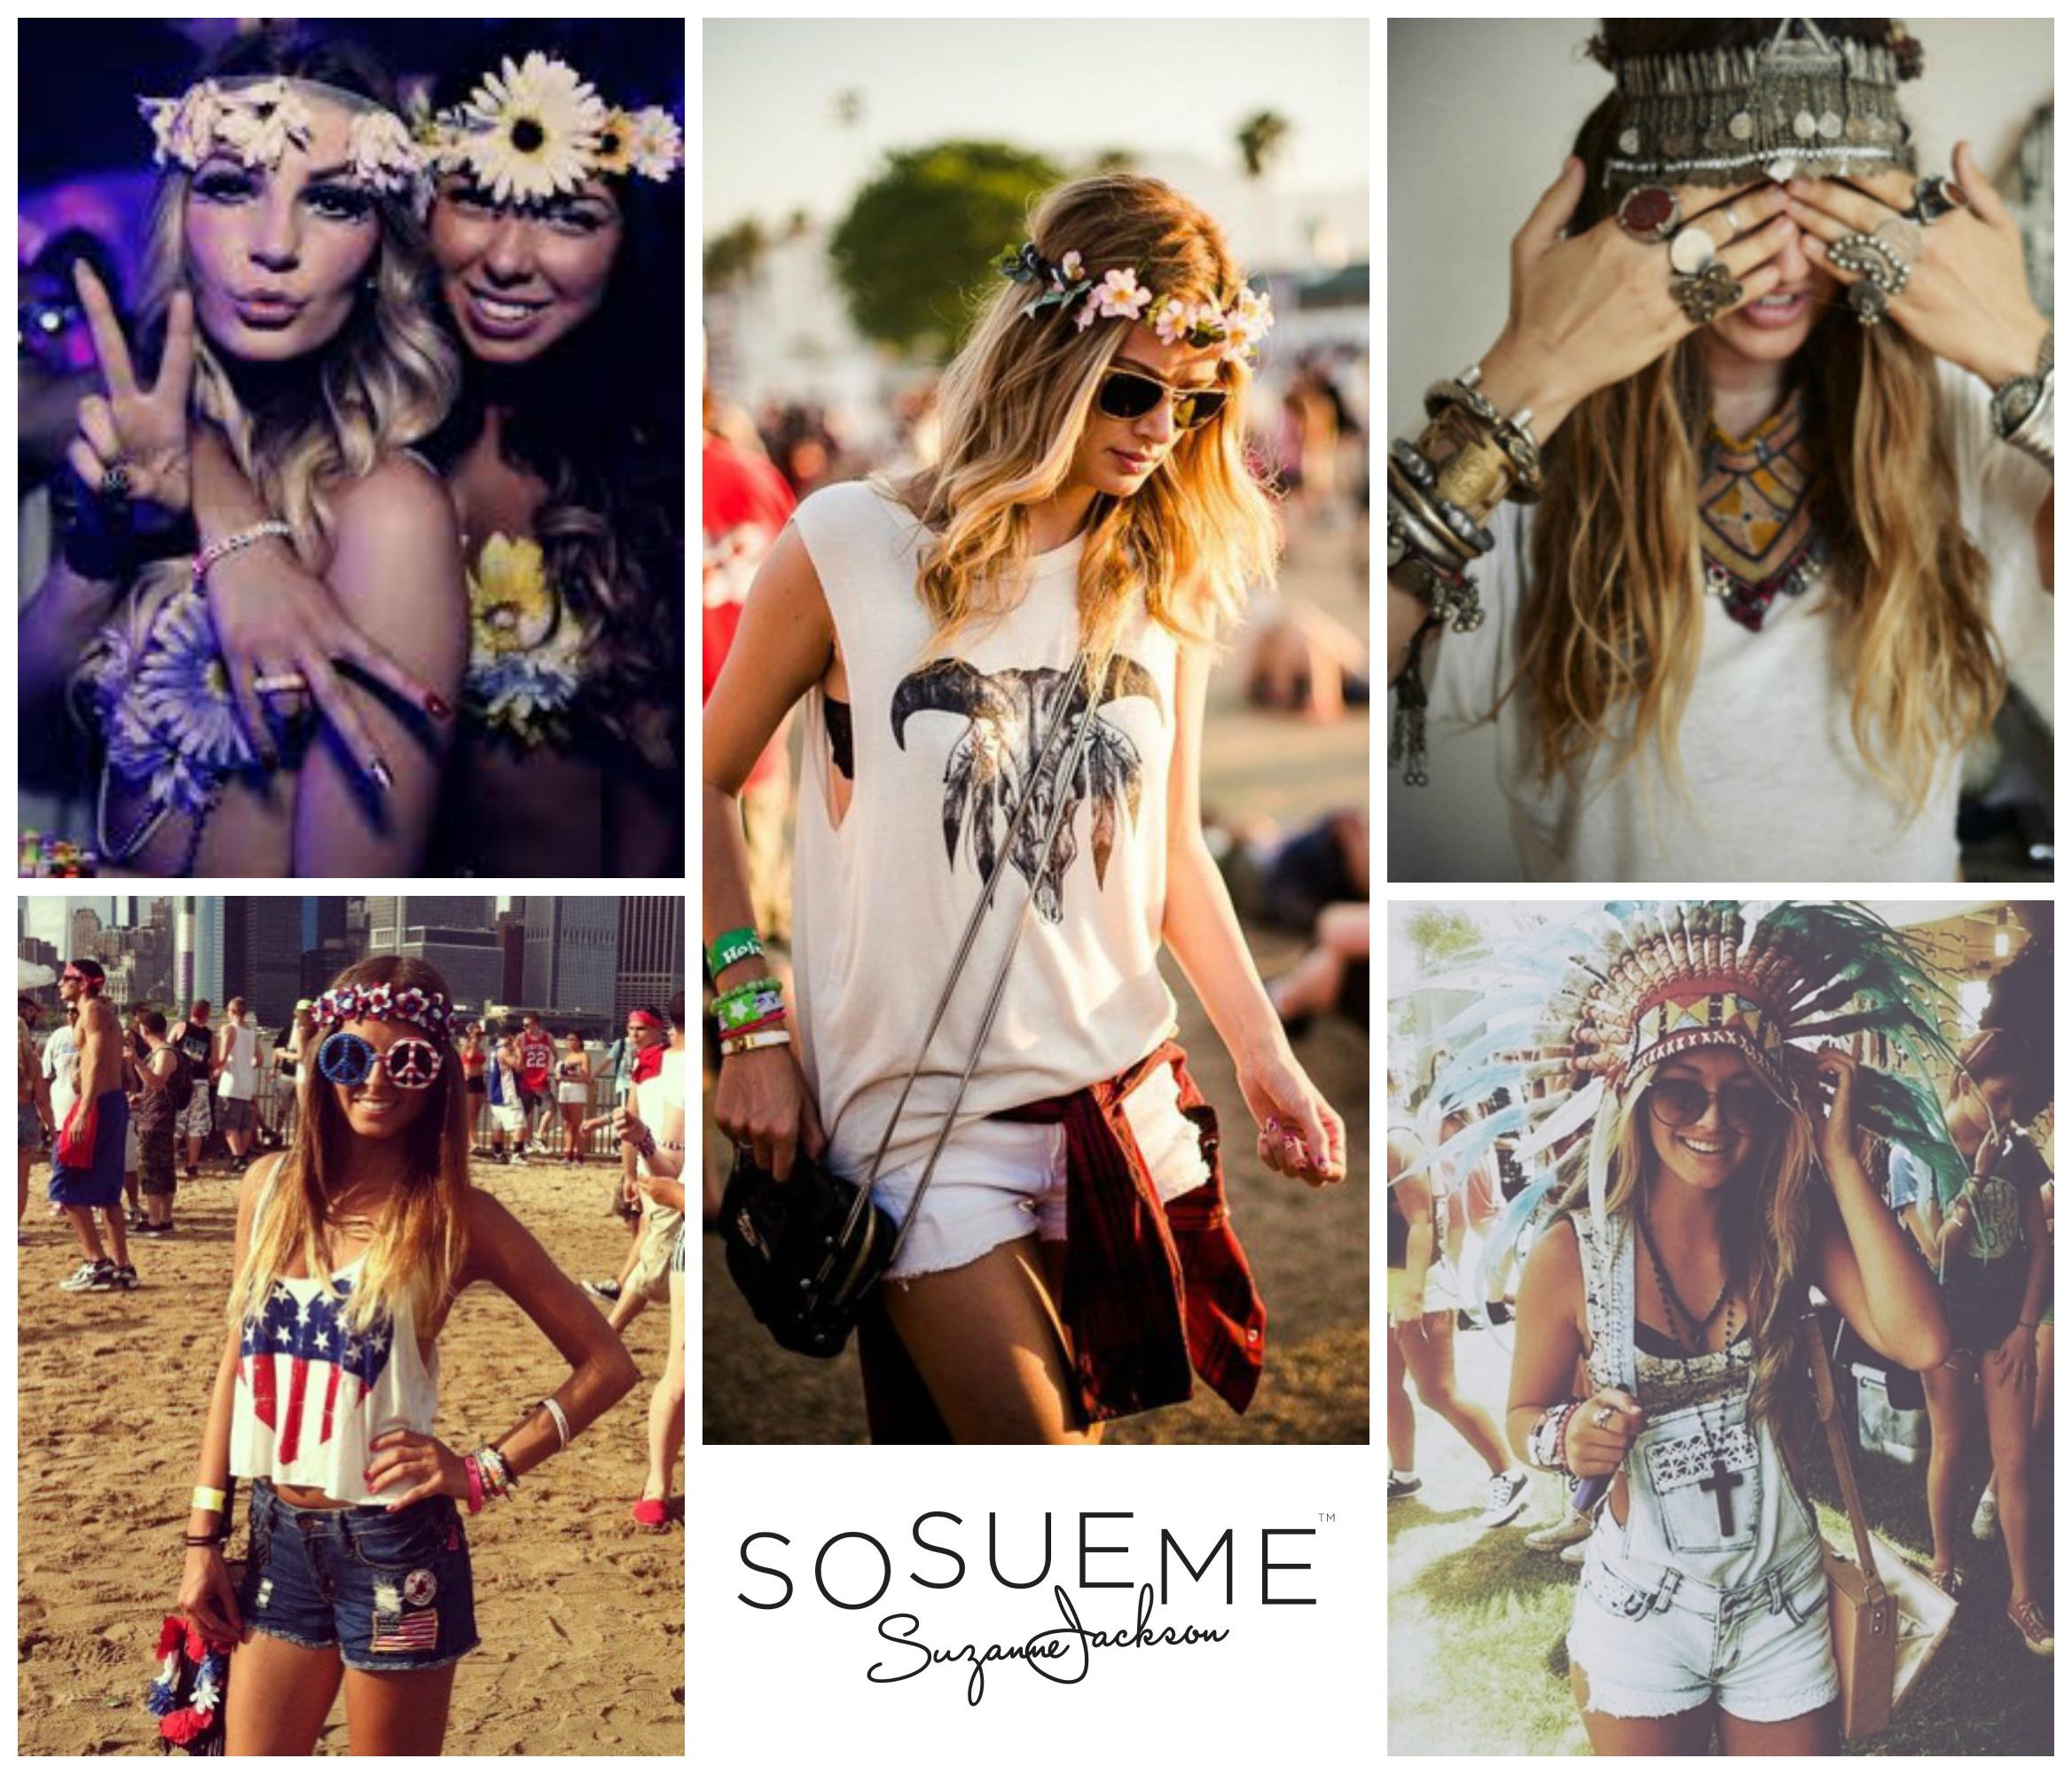 Festival Fashion Outfit Ideas So Sue Me